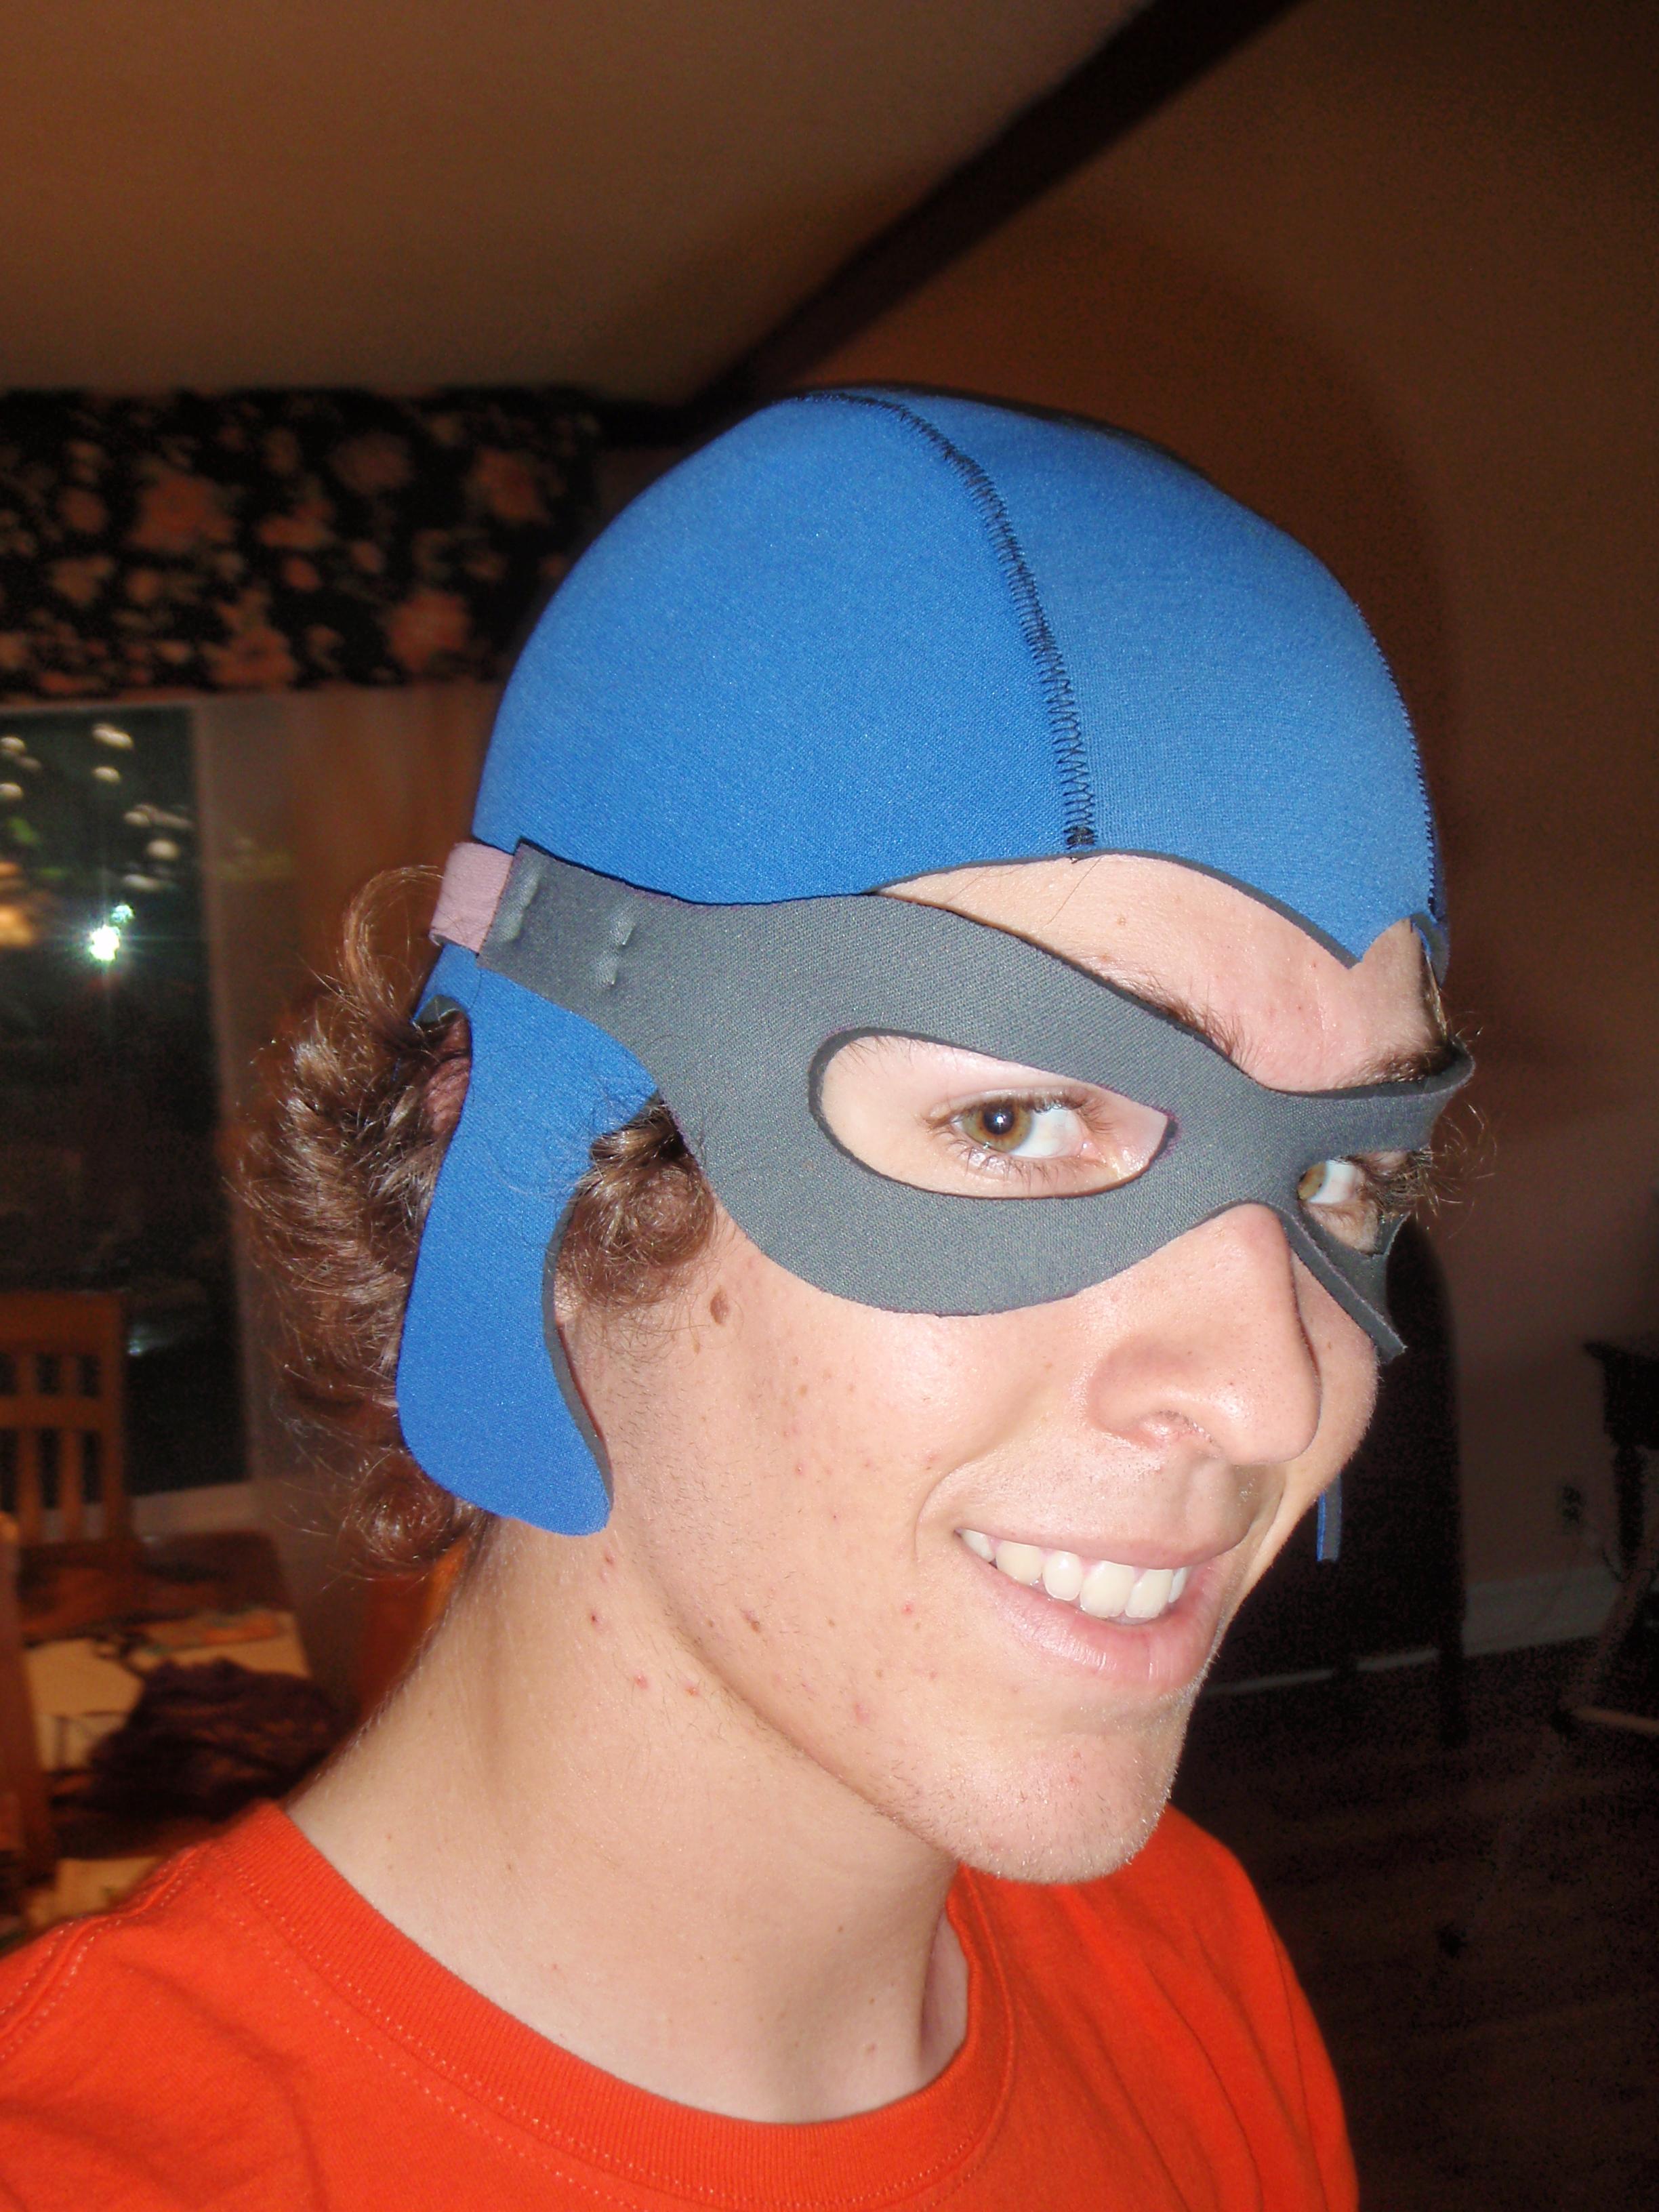 Aquabats Anti-Negativity Helmet